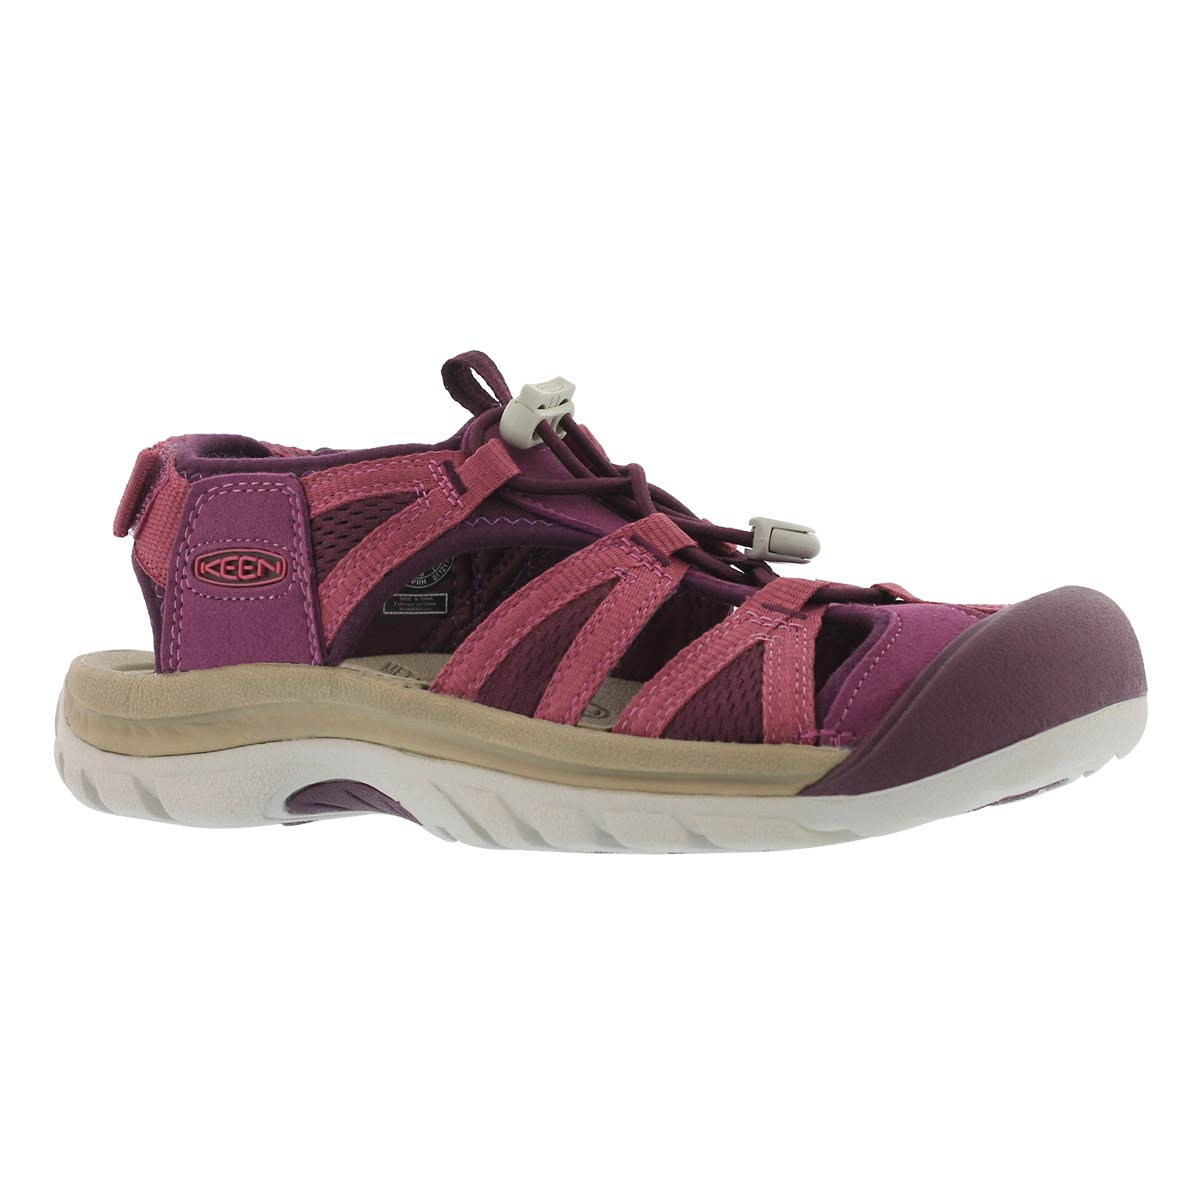 Lds Venice II H2 grape kiss sport sandal